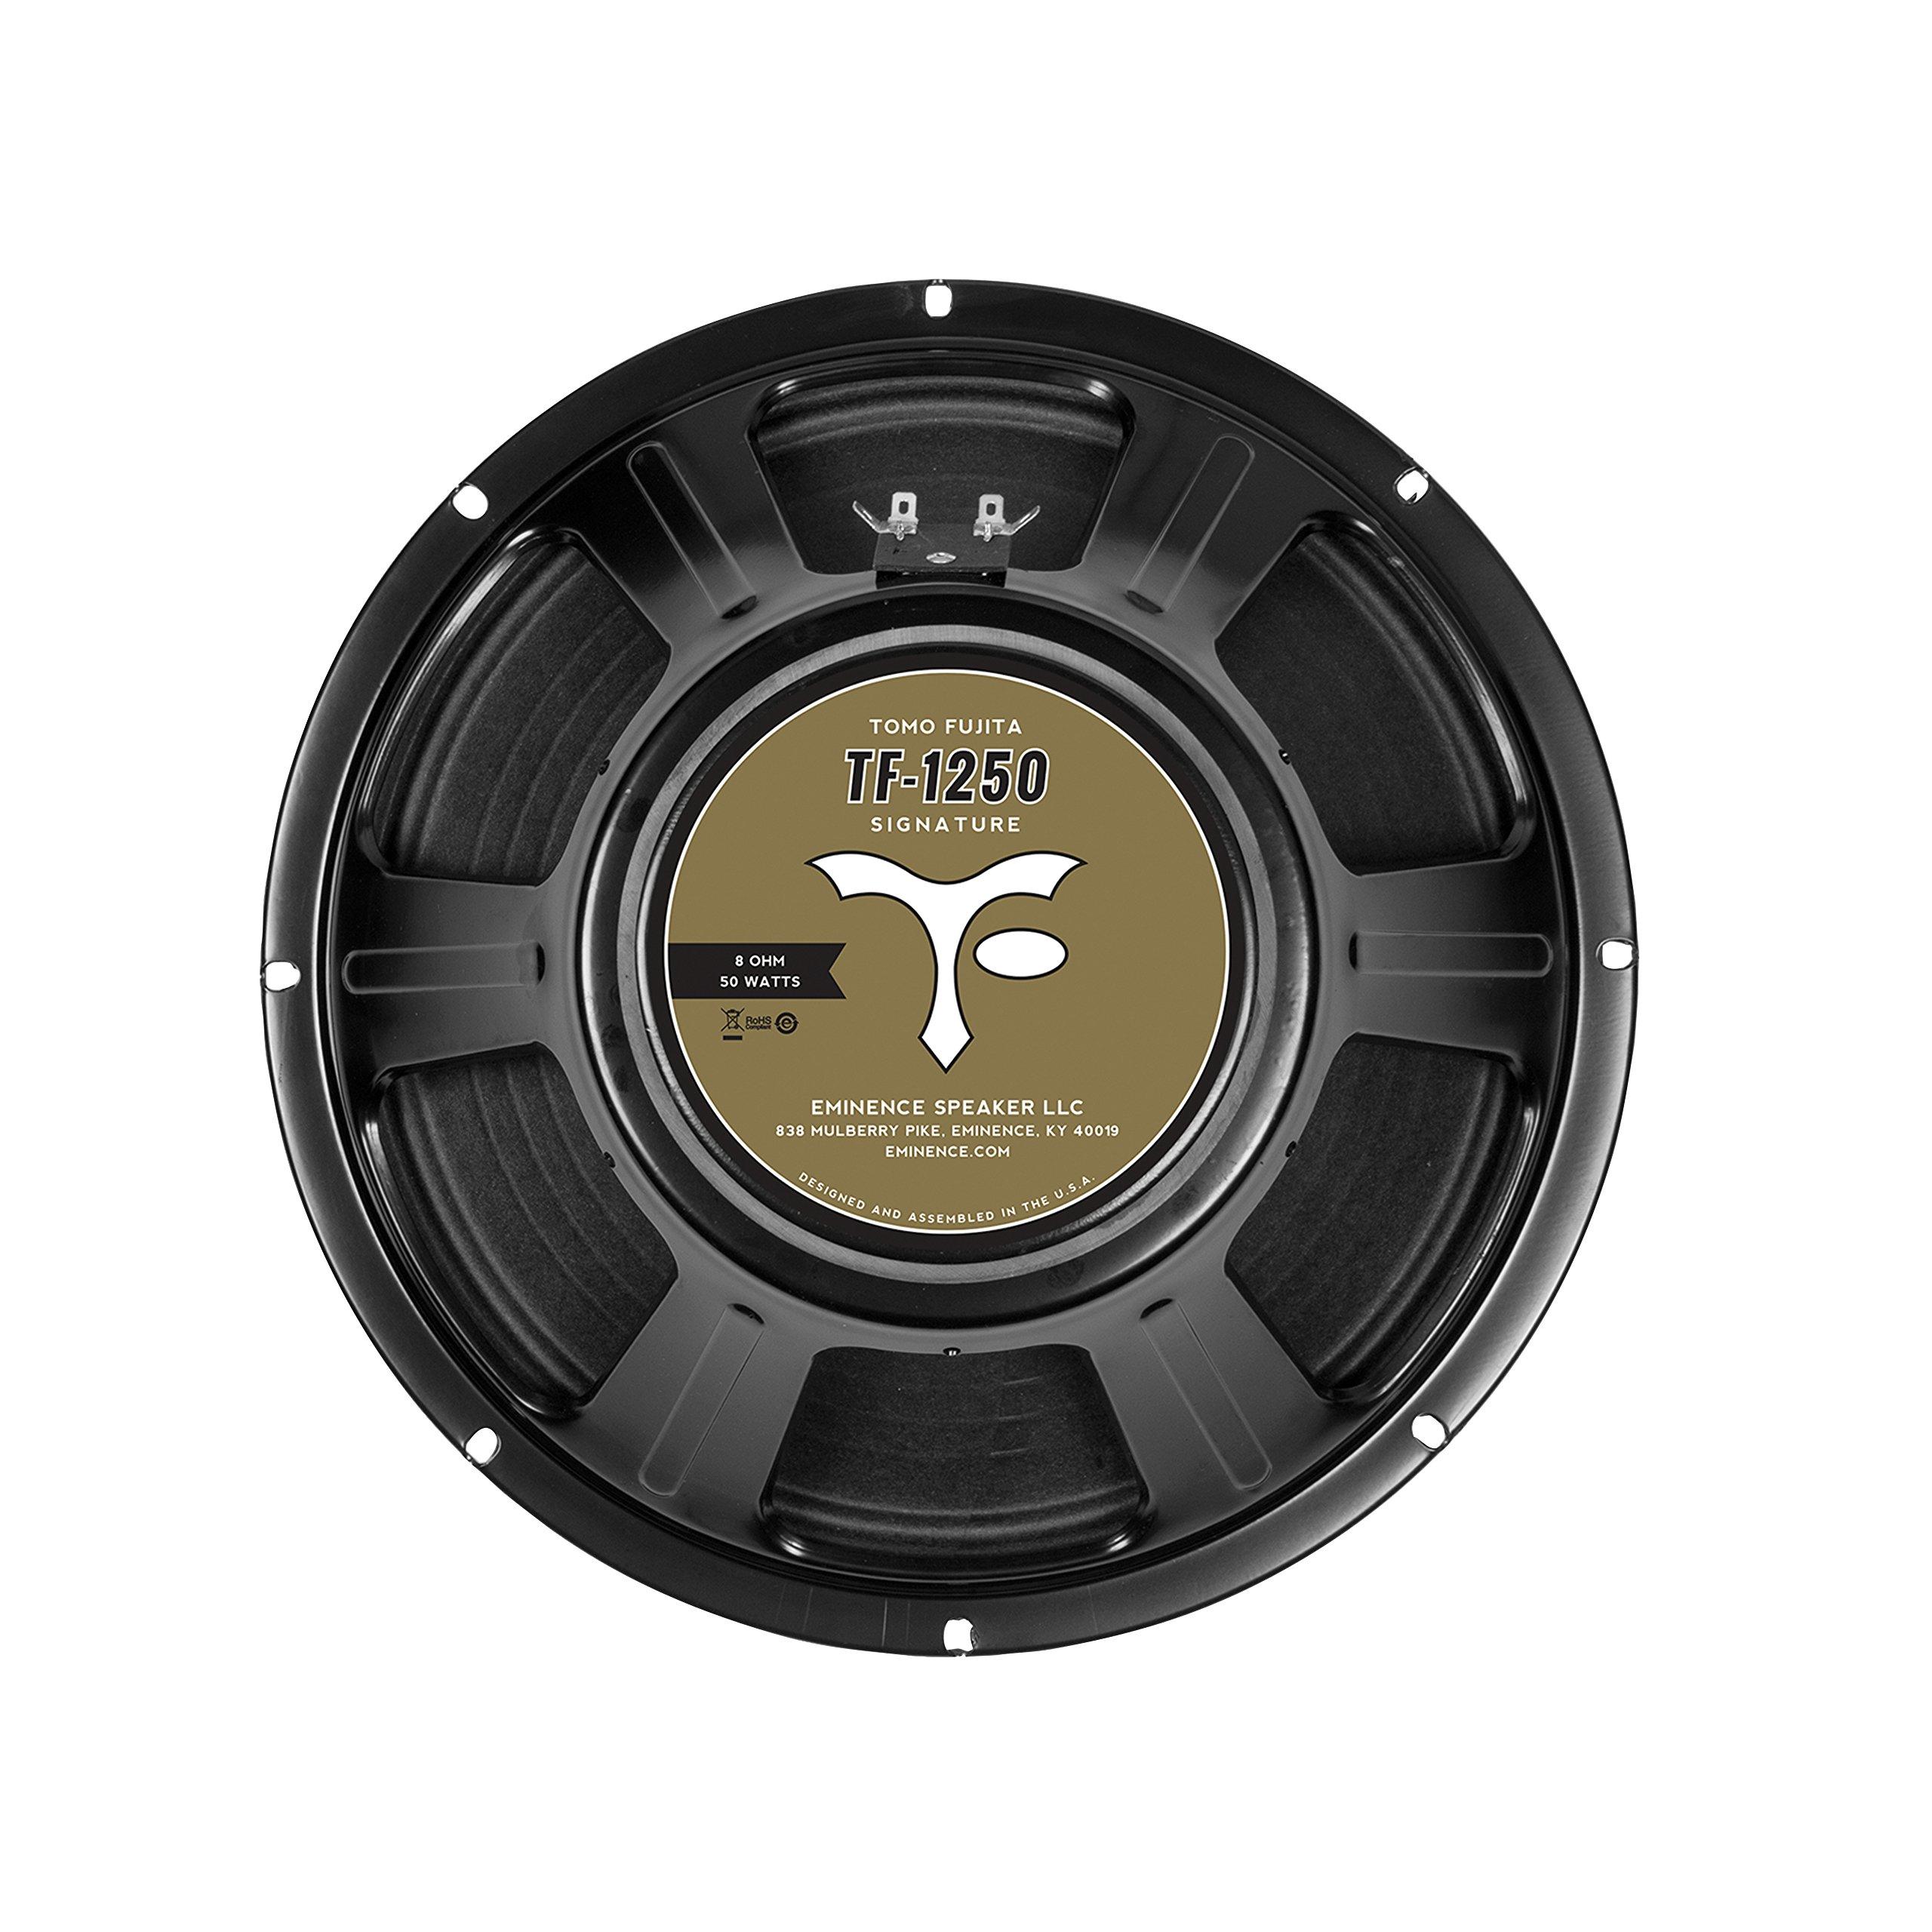 Eminence Signature Series TF-1250 12'' Tomo Fujita Guitar Speaker, 50 Watts at 8 Ohms